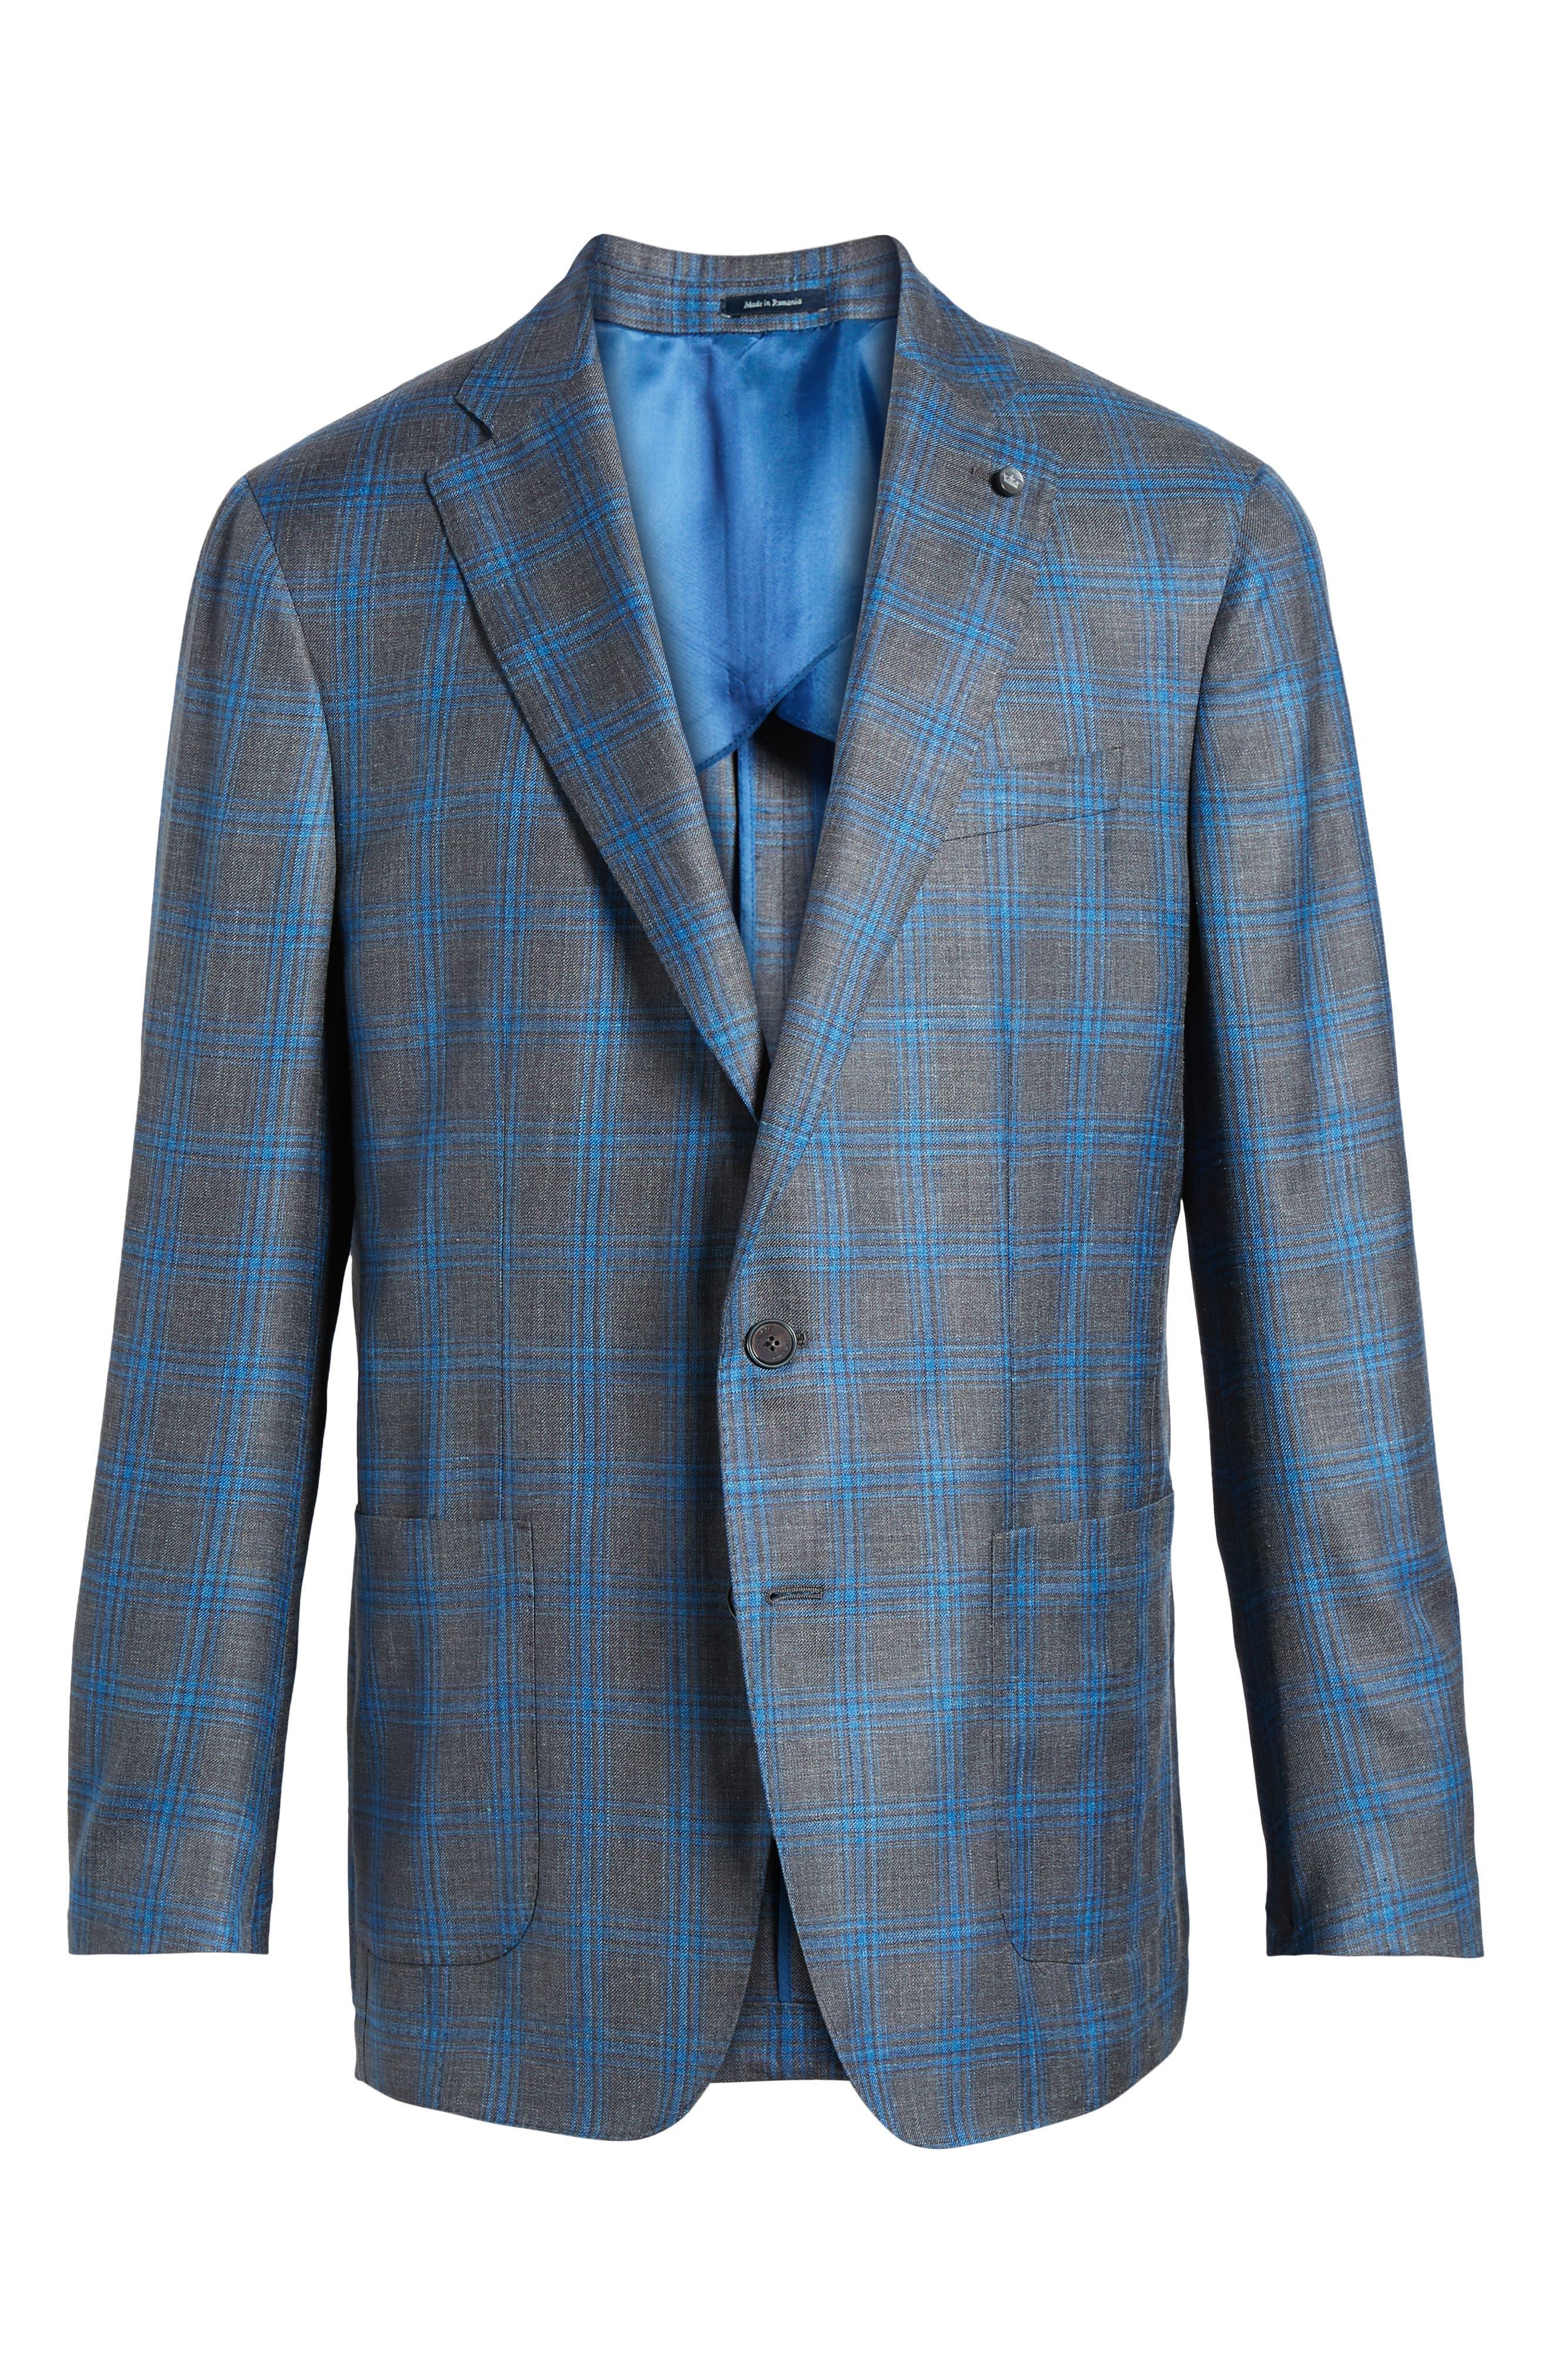 PETER MILLAR COLLECTION,                             Marina Windowpane Wool & Silk Blend Sport Coat,                             Alternate thumbnail 5, color,                             400